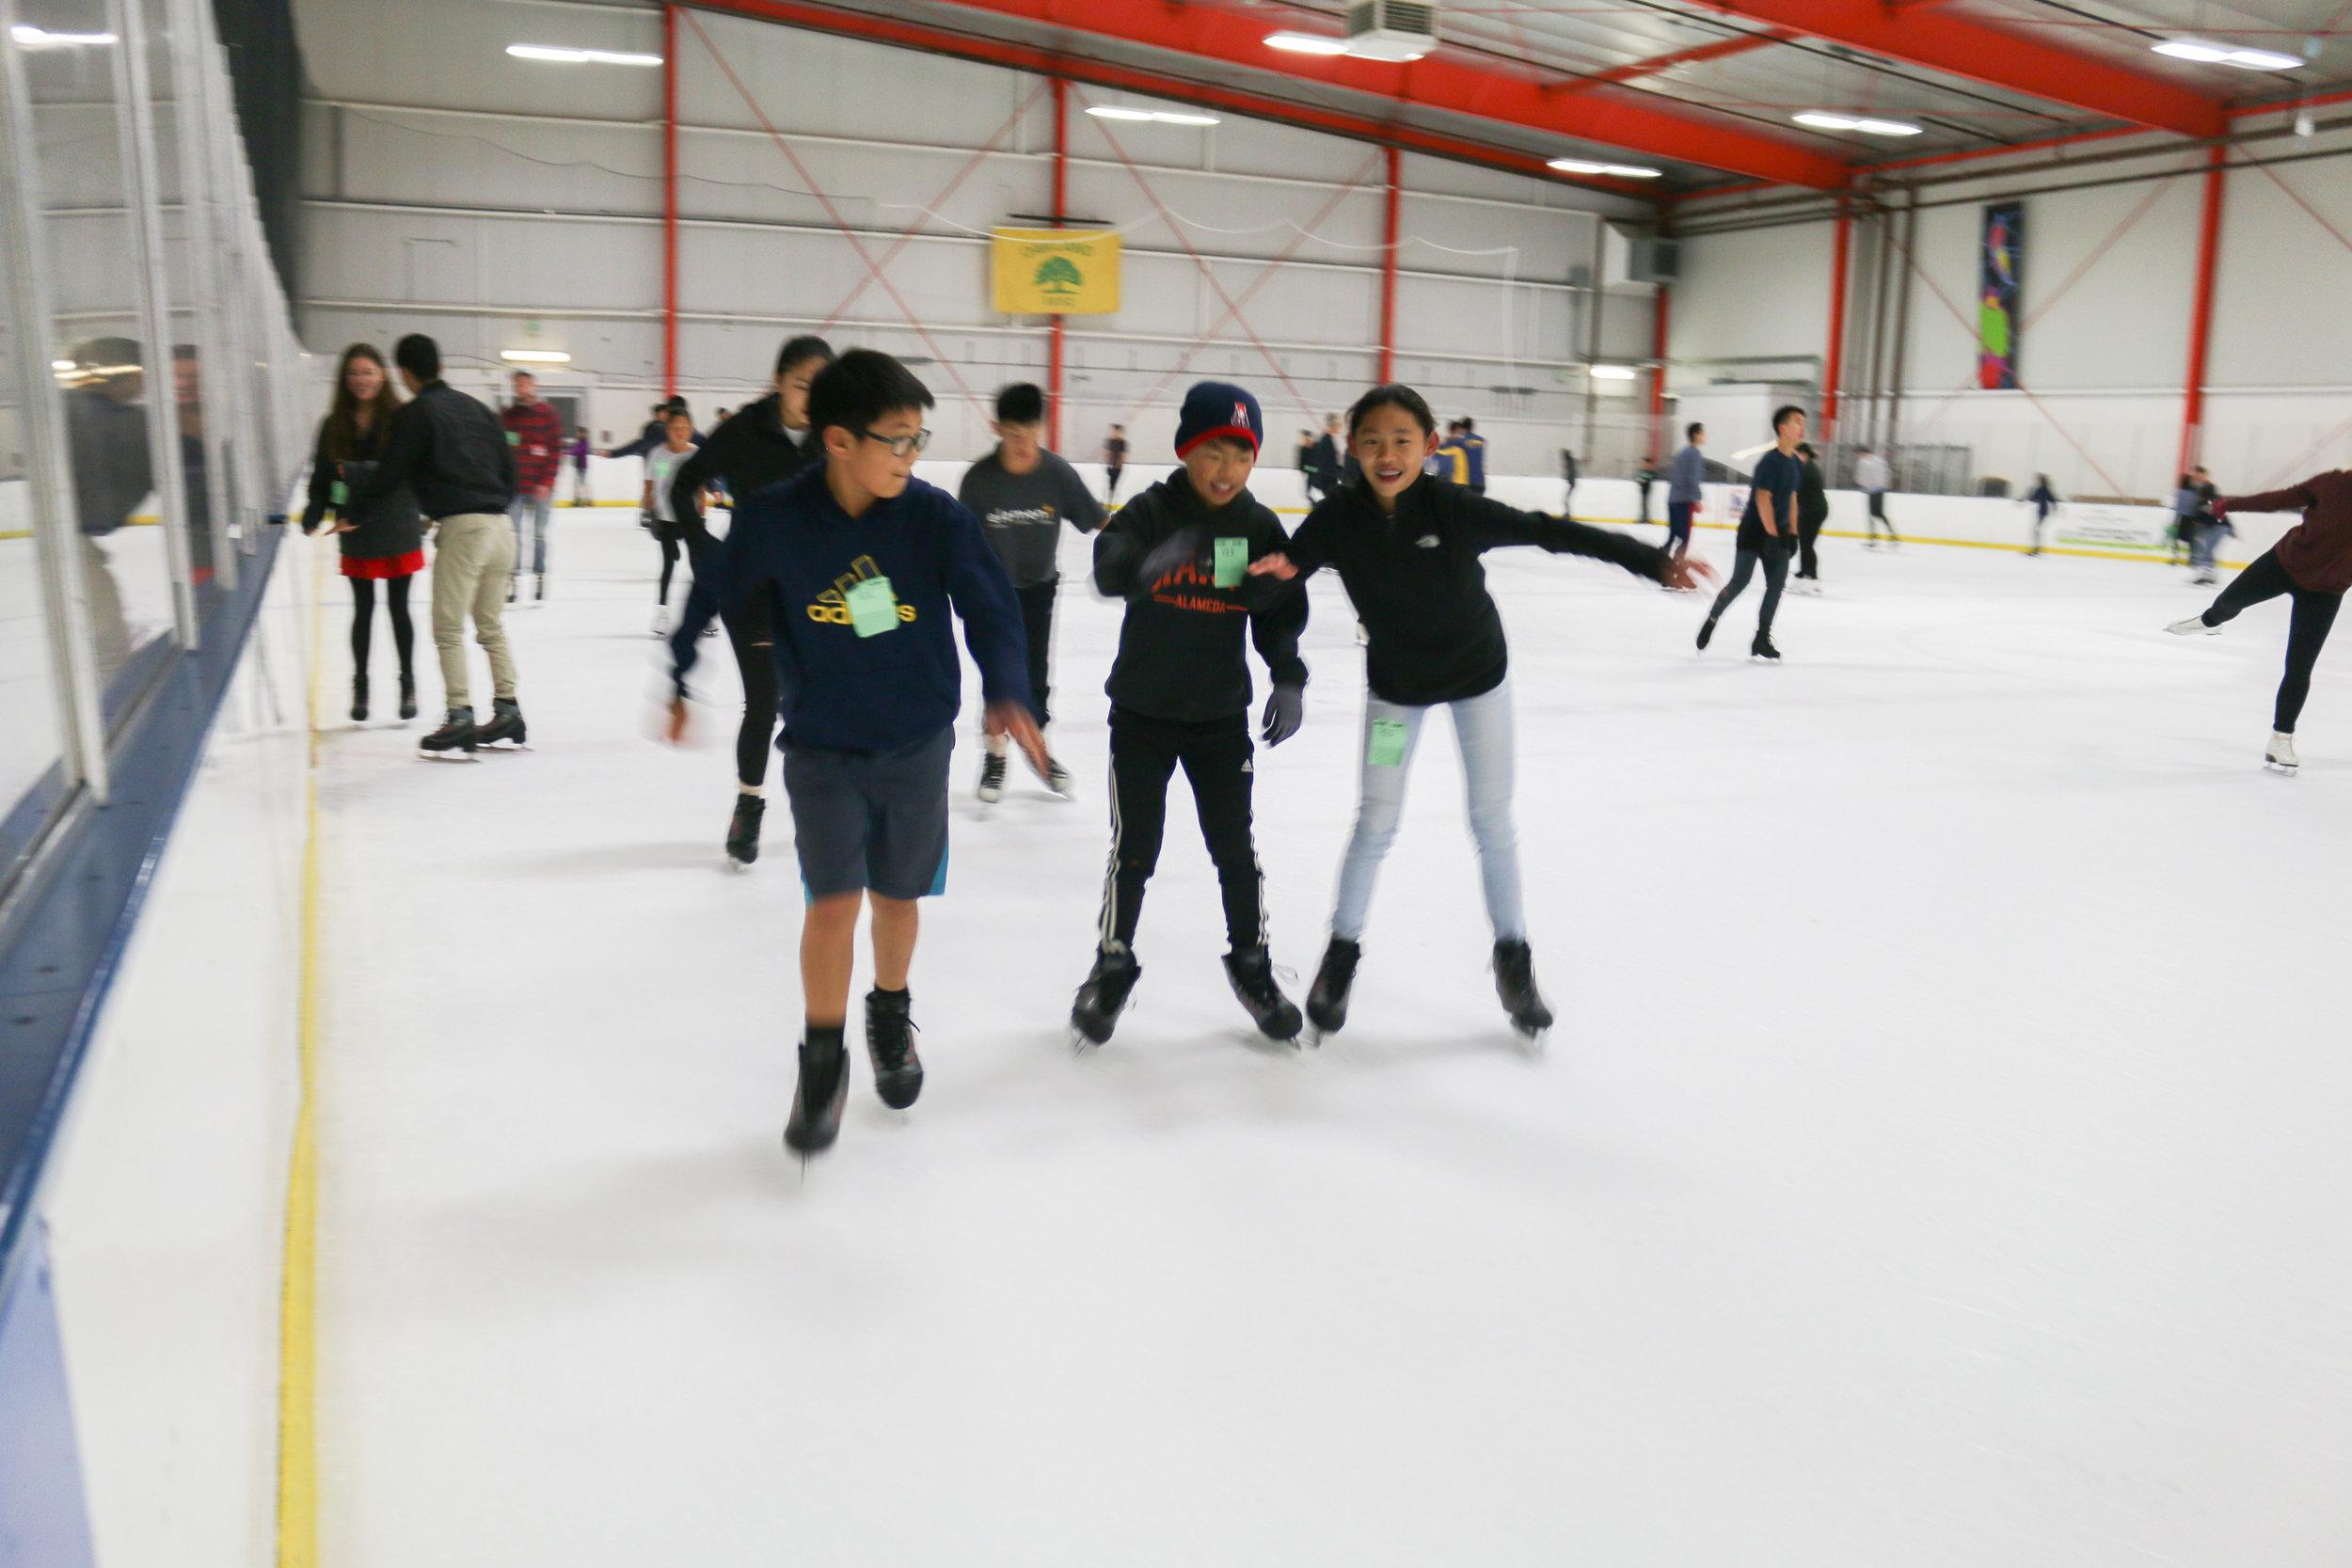 2018-10-05_ElementMS_FridayBibleStudy_IceSkating-3.jpg